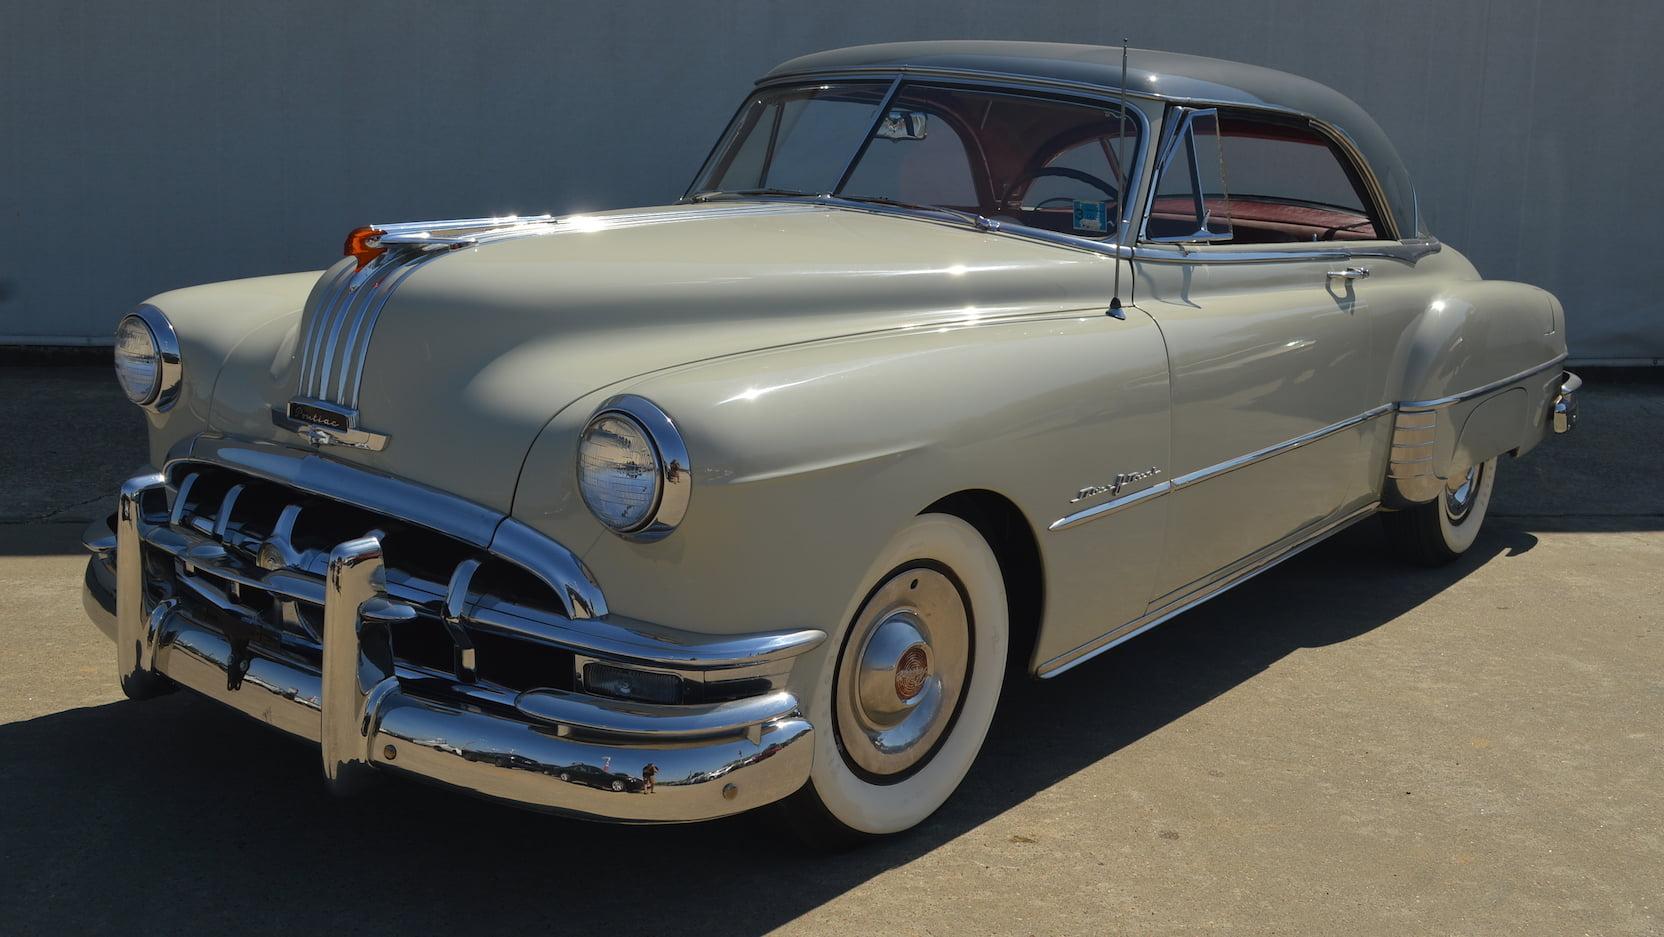 1950 Pontiac Chieftain Deluxe